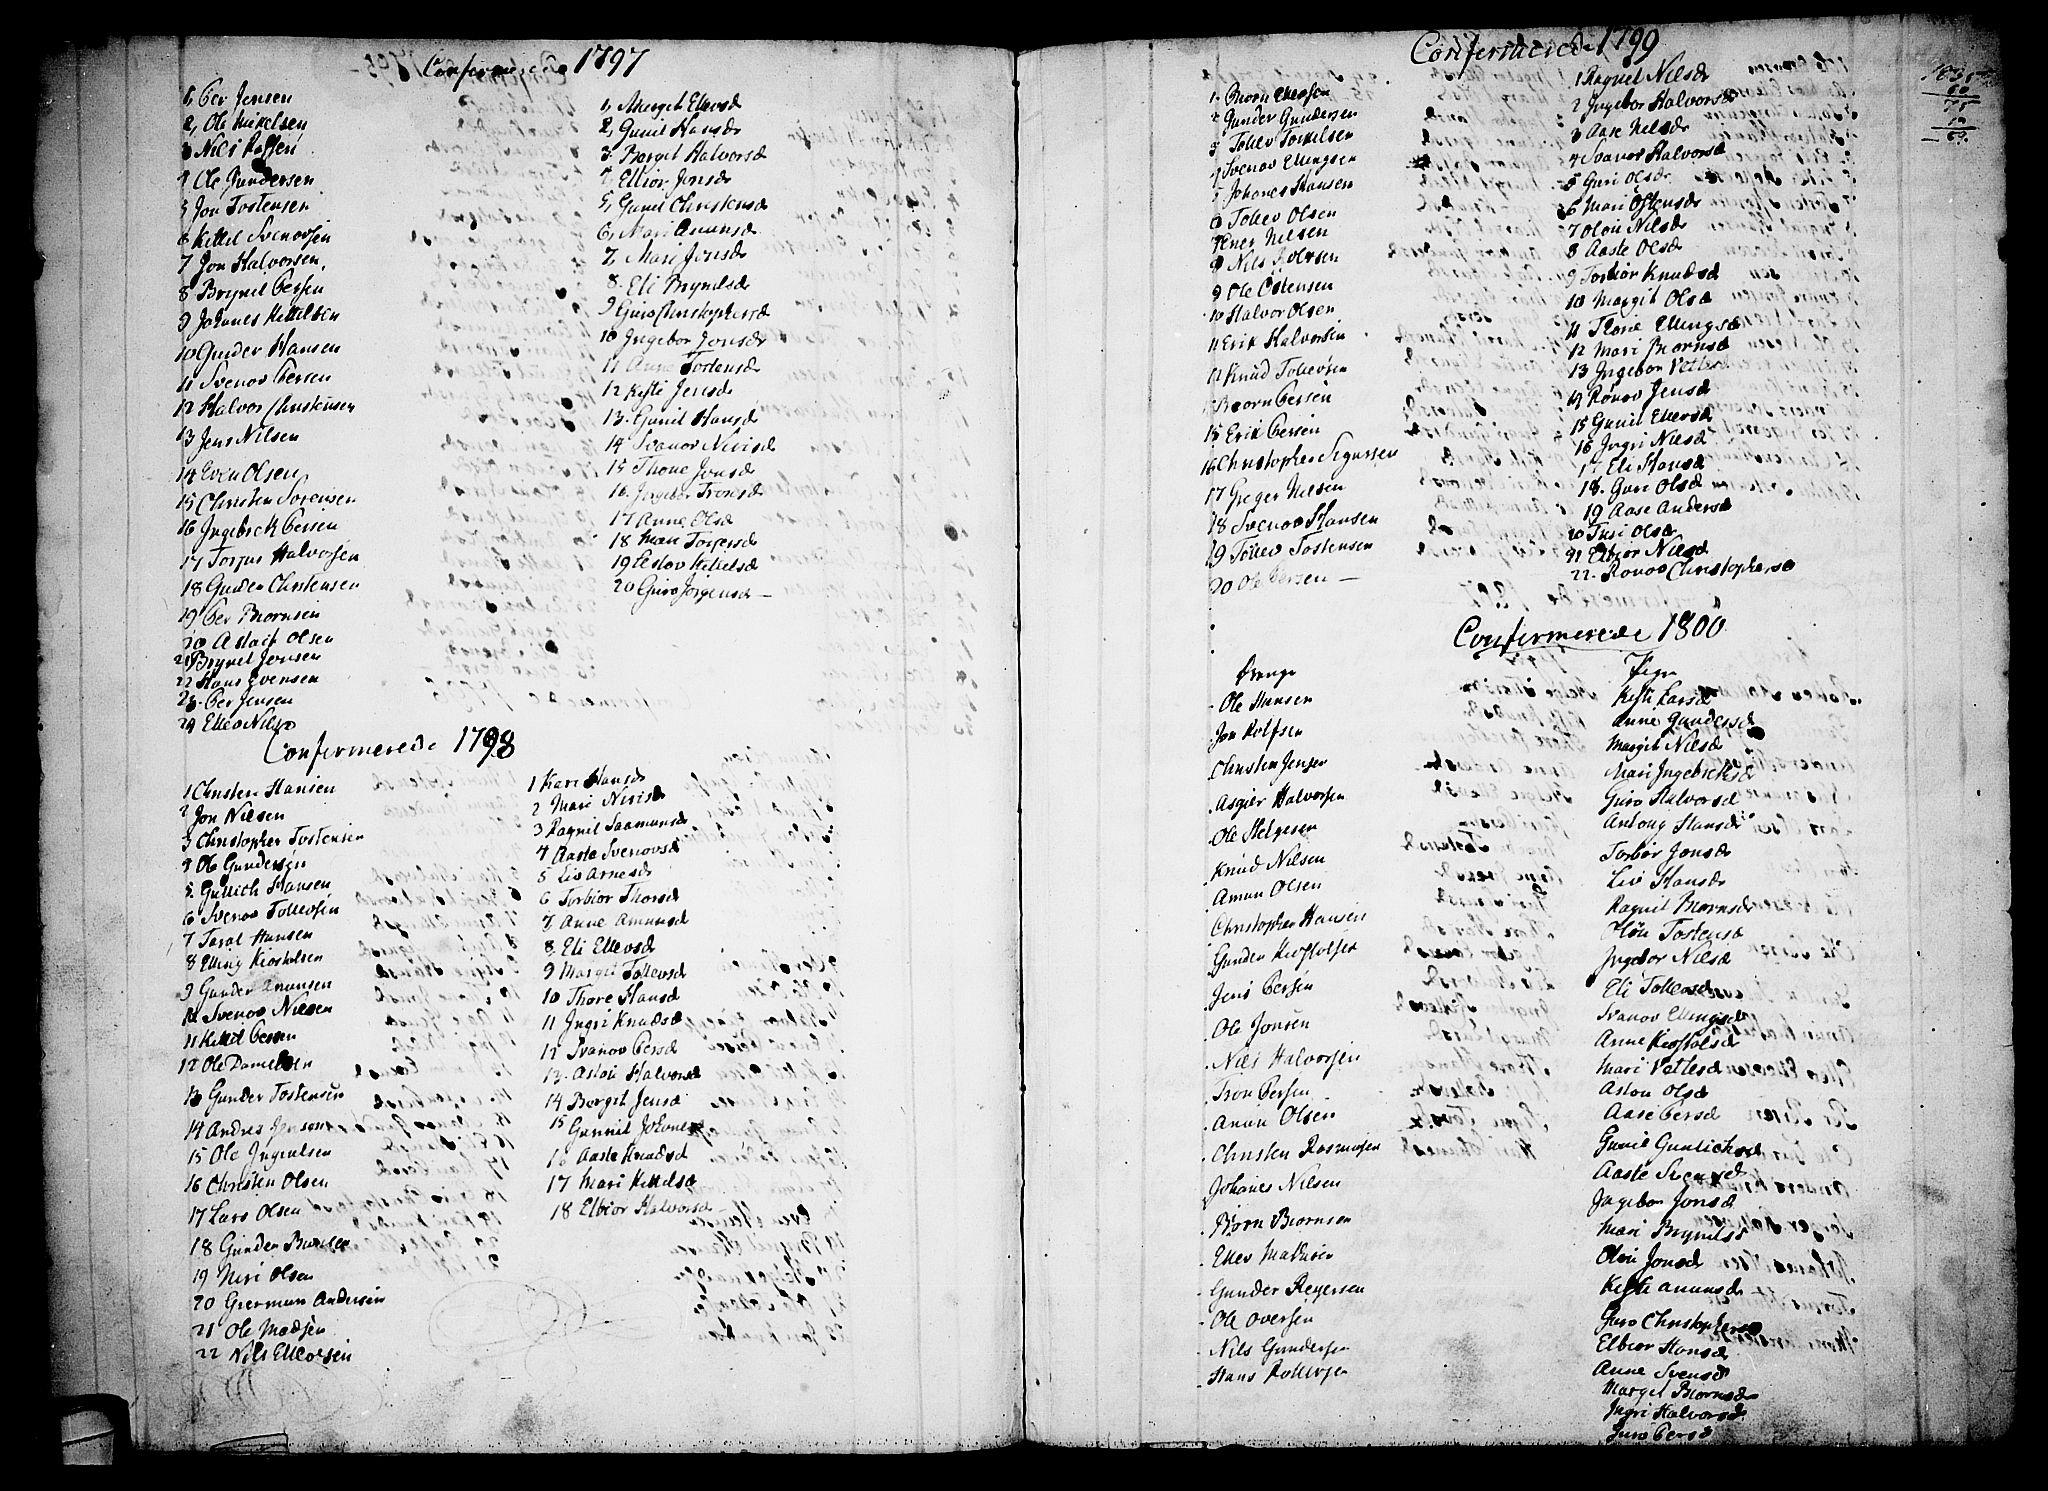 SAKO, Sauherad kirkebøker, F/Fa/L0003: Ministerialbok nr. I 3, 1722-1766, s. 172-173